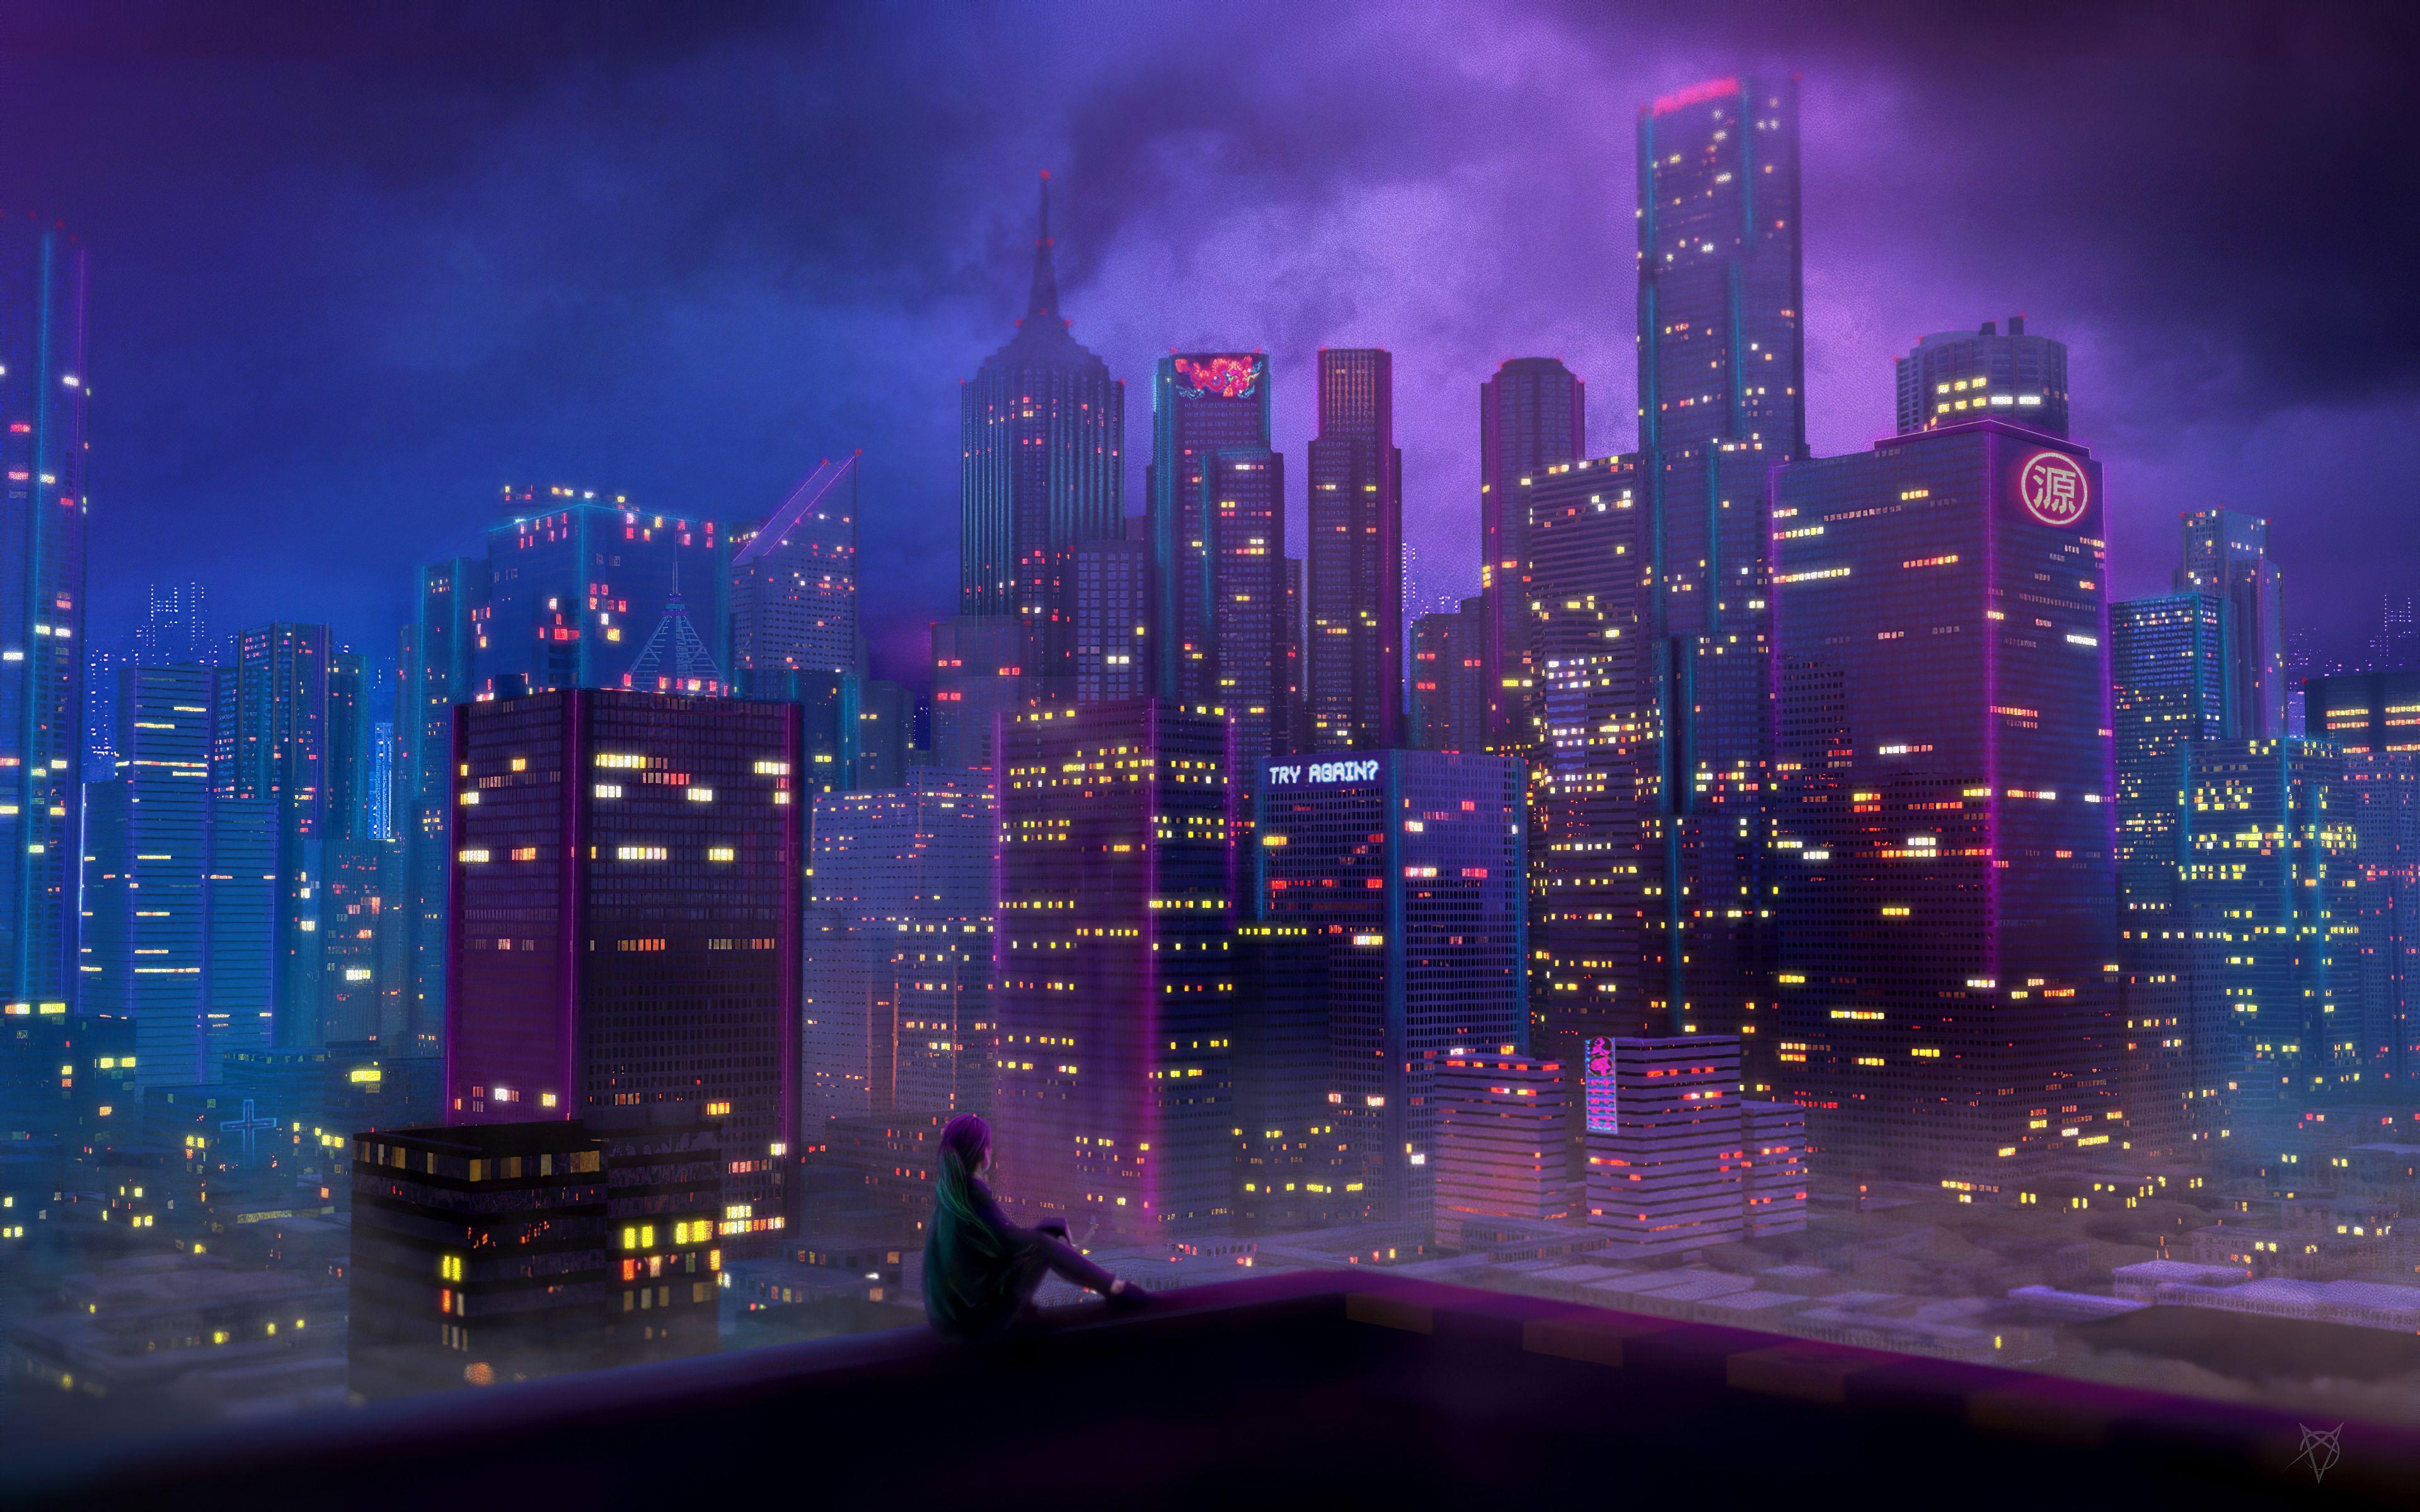 Anime City Girl In 2020 Anime Wallpaper Phone Anime City Hd Anime Wallpapers